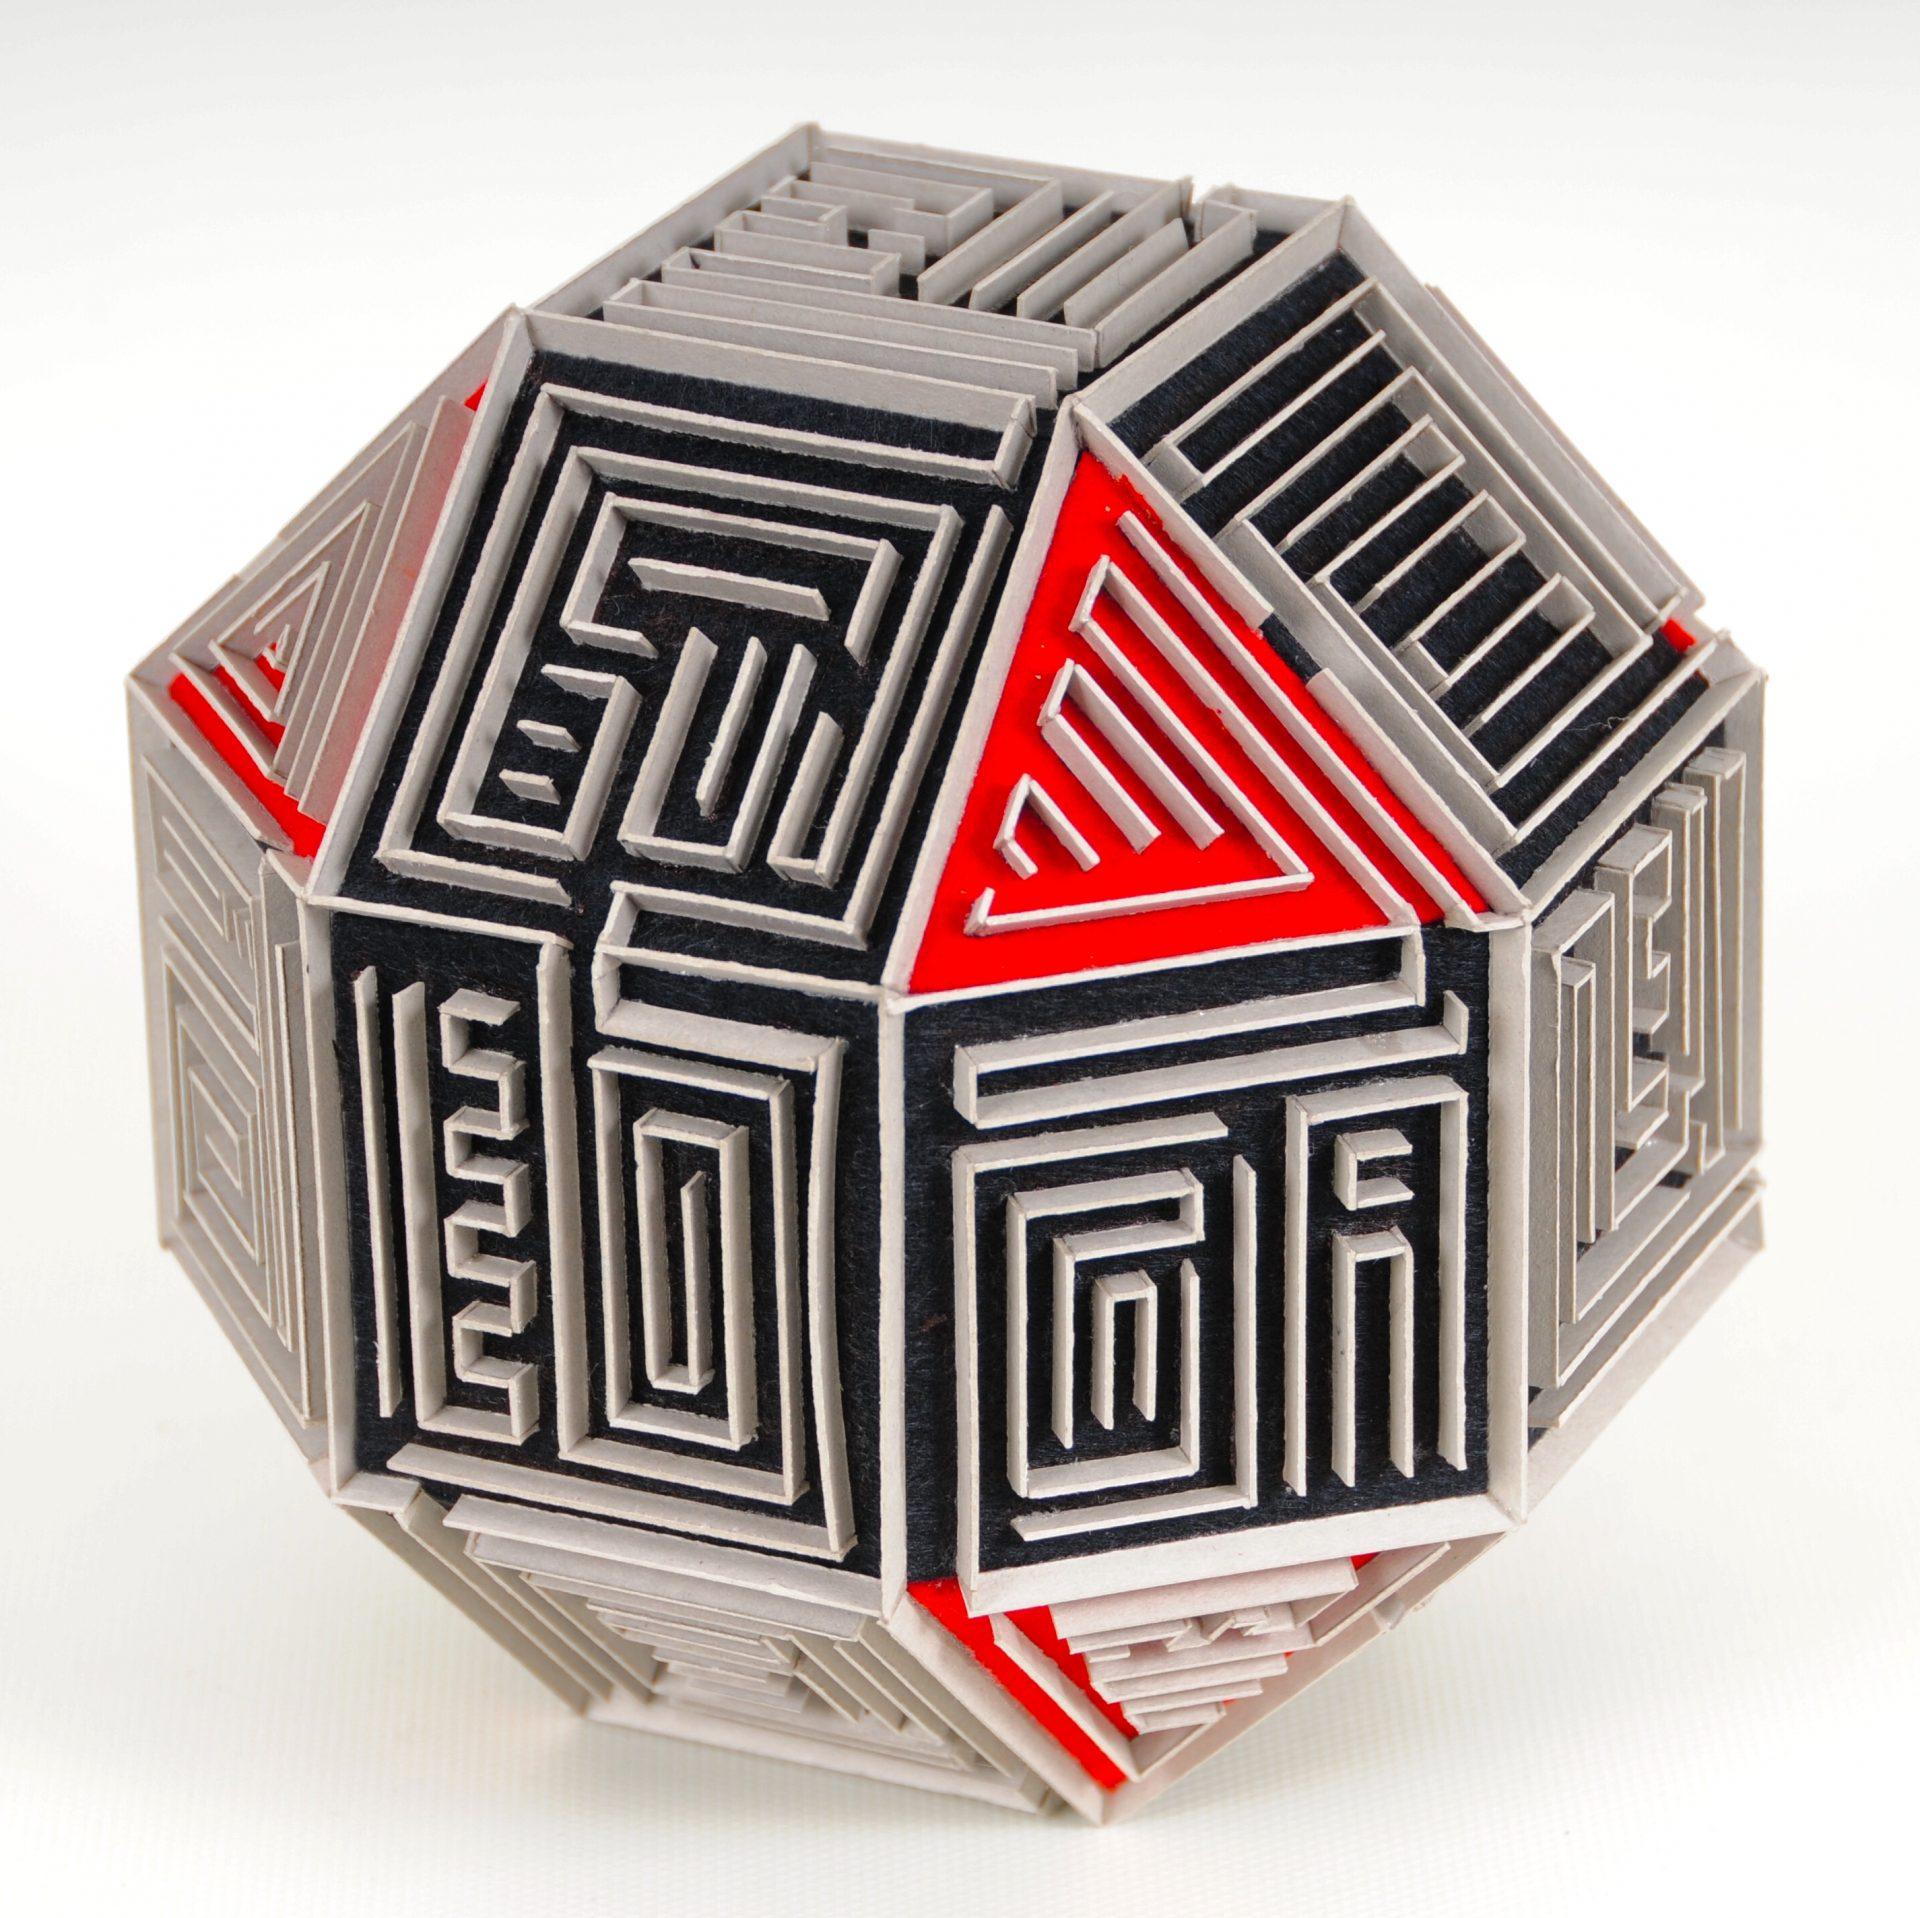 CT-002 cardboard,felt 19x19x19cm